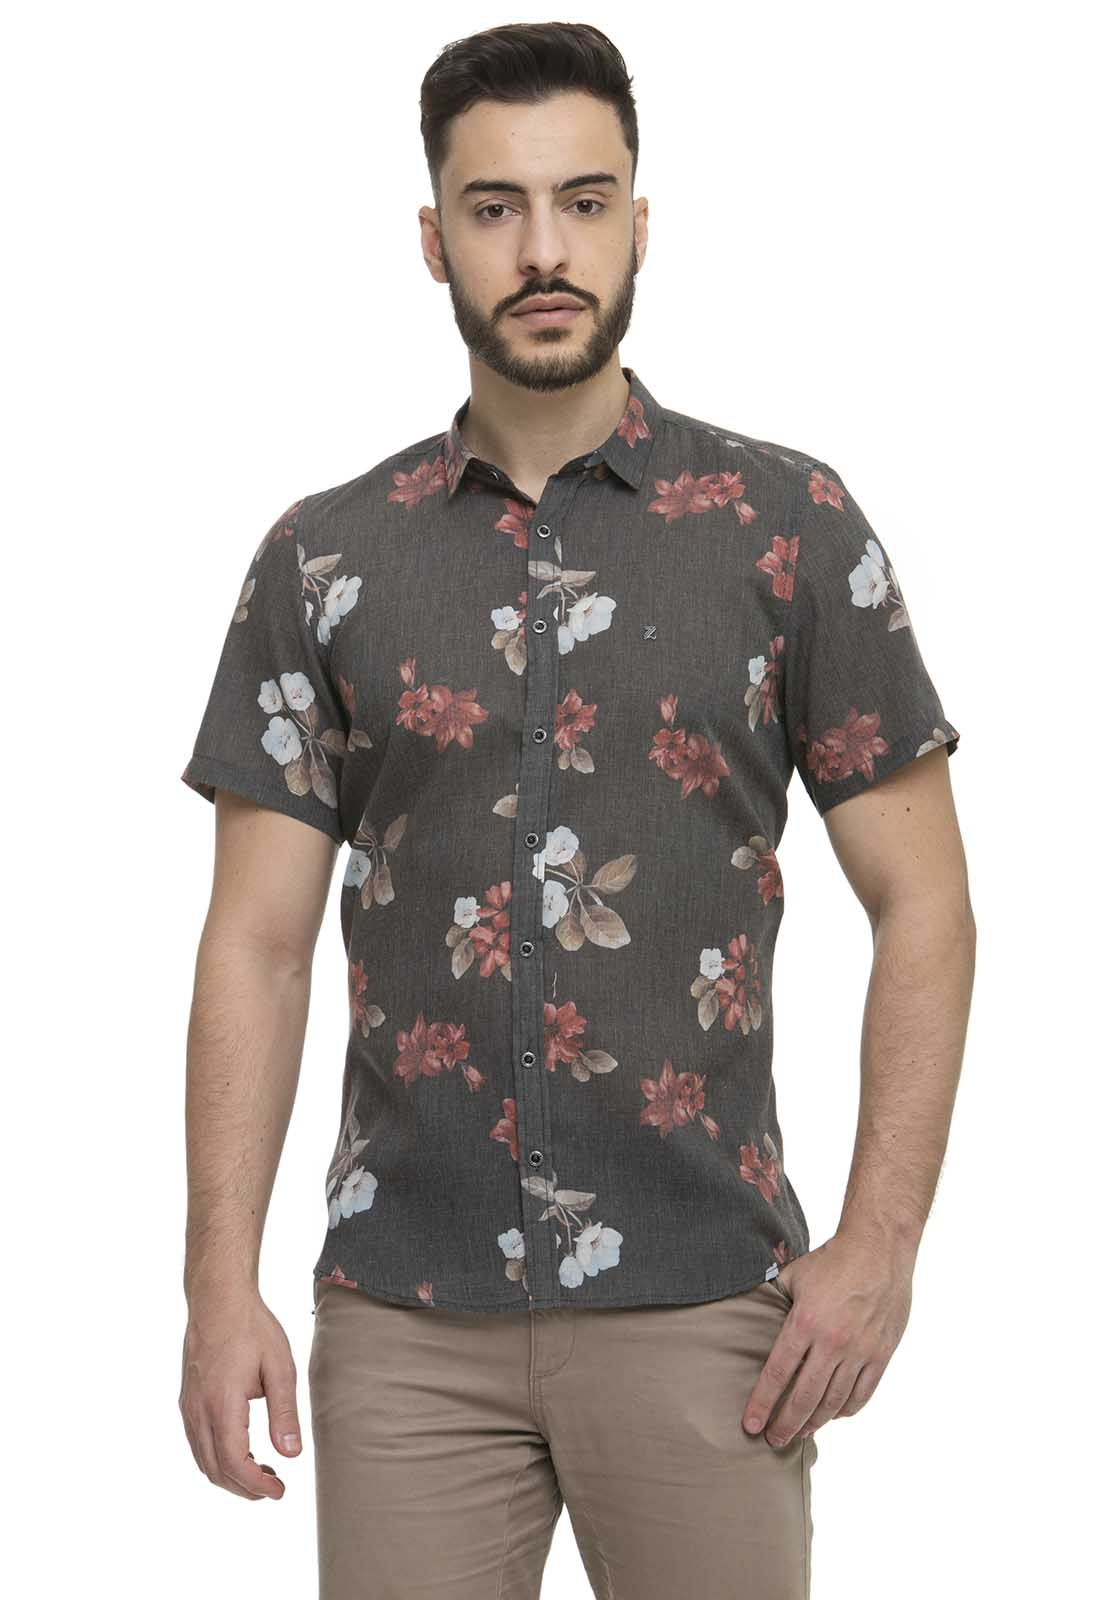 Camisa Social Slim Zaiko Estampada Floral Manga Curta 2257